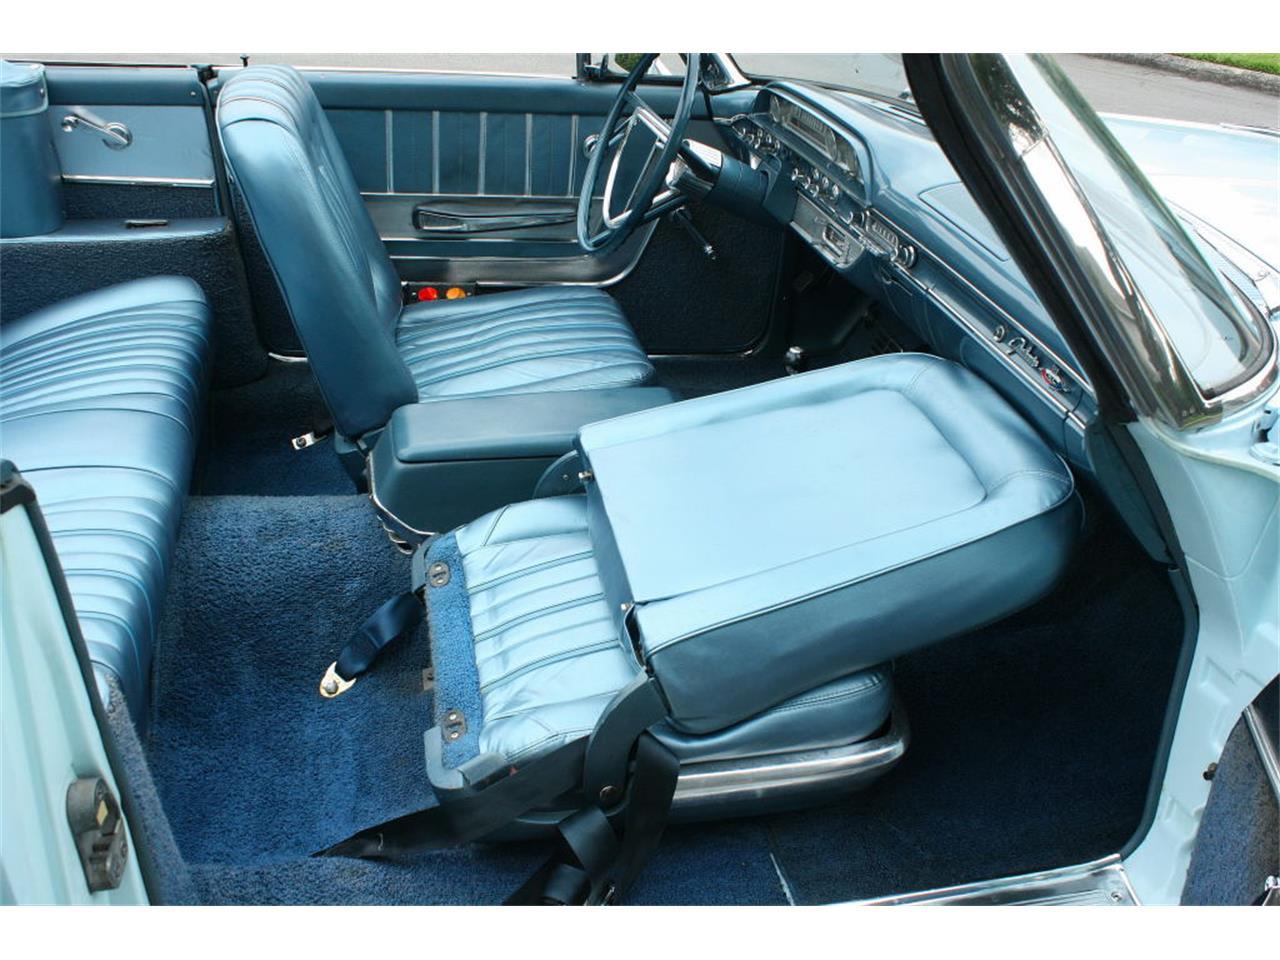 Large Picture of '62 Galaxie - $26,500.00 - L6EK